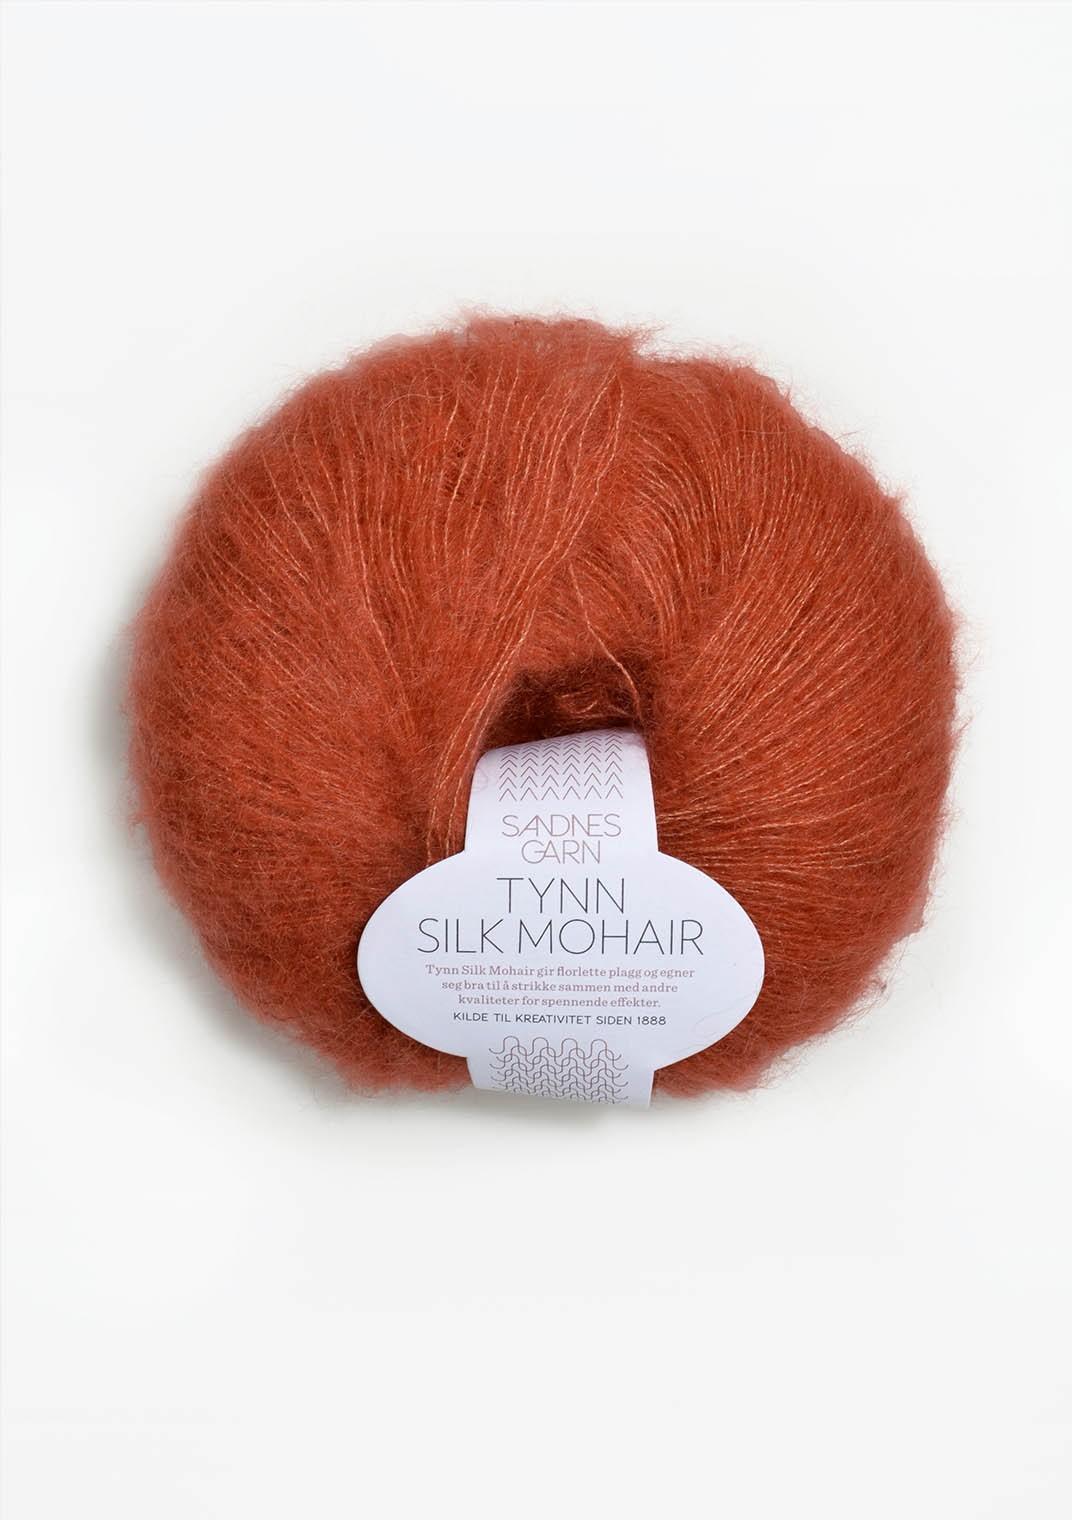 Tynn silk mohair, 3835 terracotta